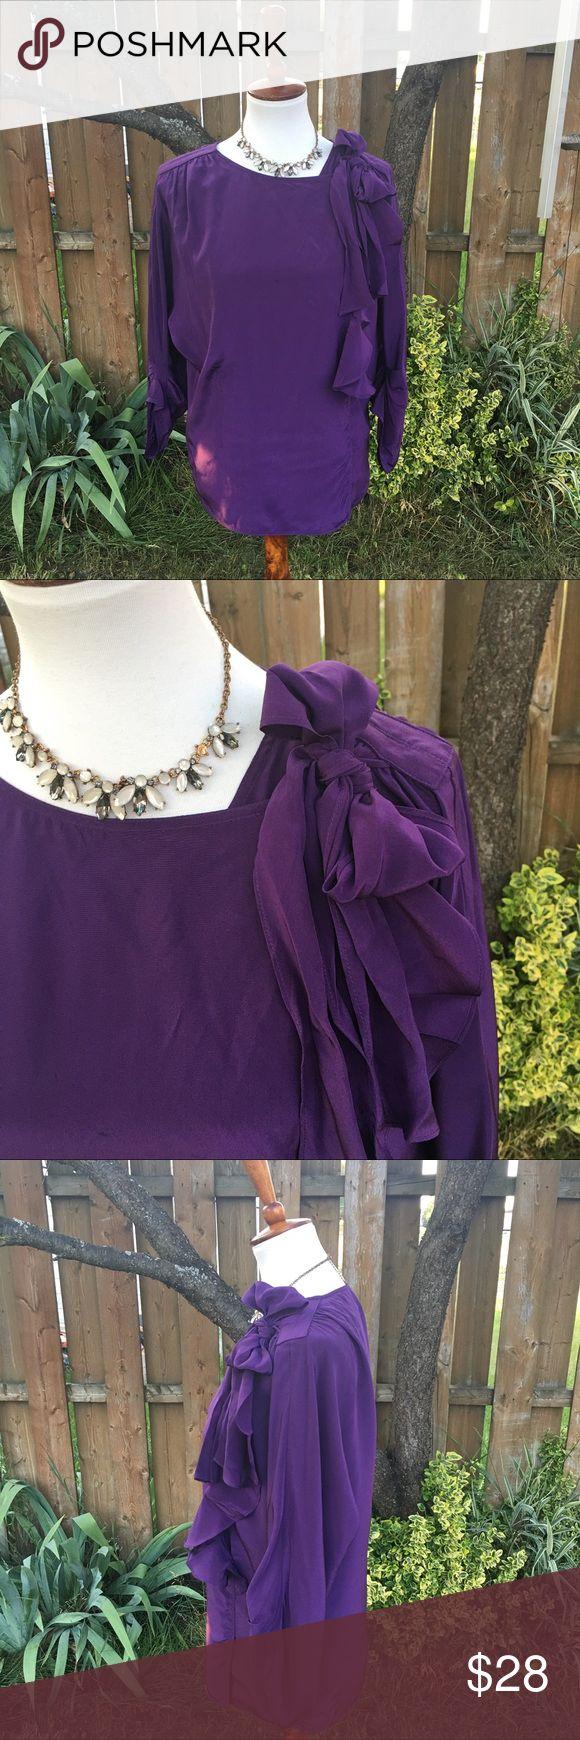 BCBG Maxazria Purple 100% Silk Ruffle Blouse Ruffle Front Blouse -- Long Sleeve -- 100% Silk --  Boat Neck -- Wrap Blouse -- Has Oversized Looked BCBGMaxAzria Tops Blouses